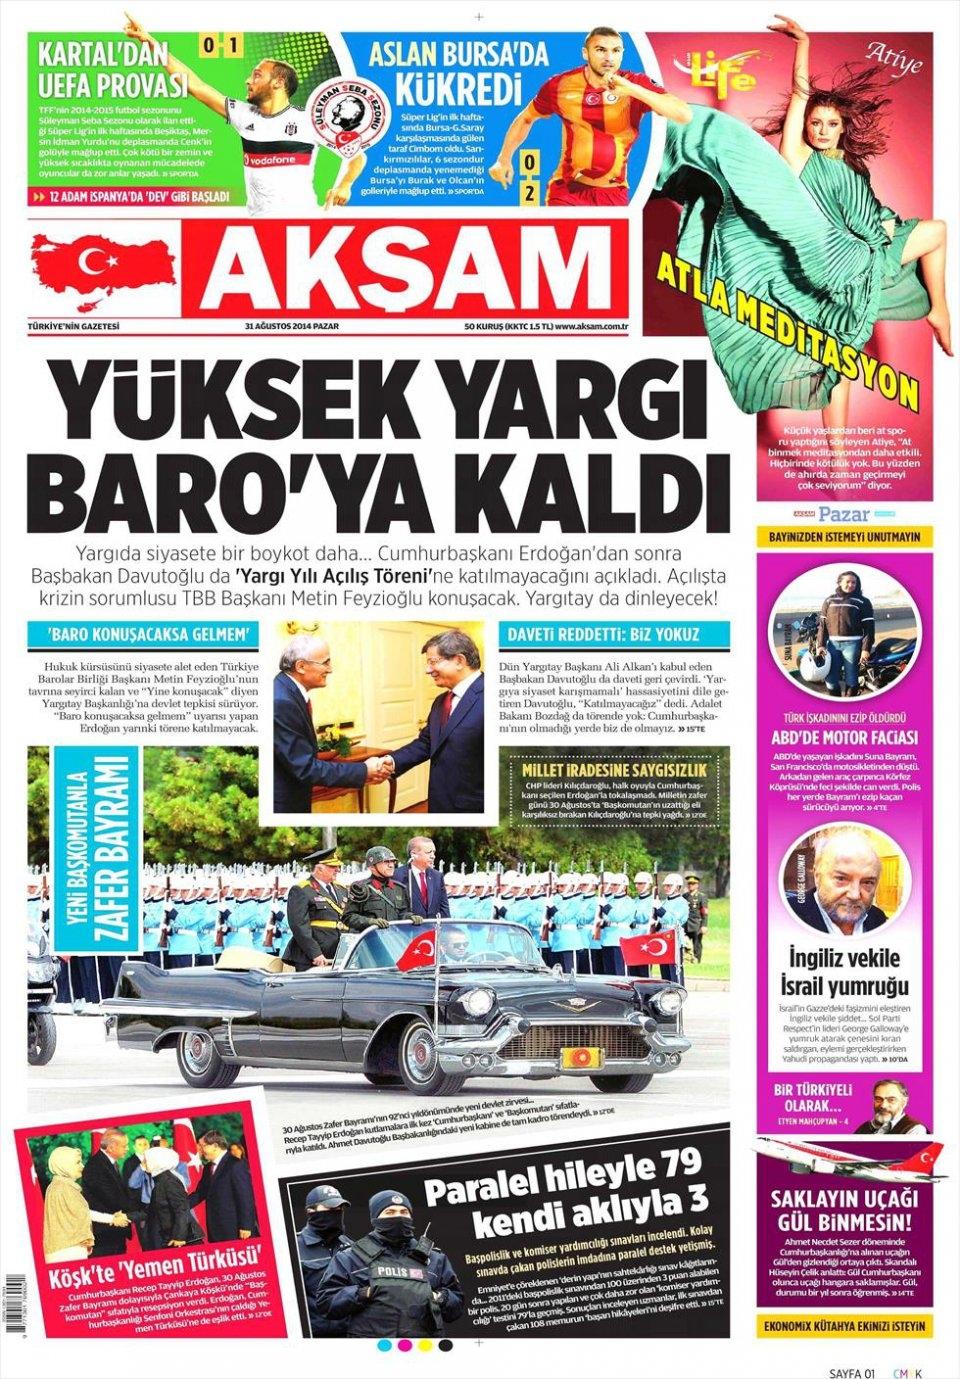 31 Ağustos 2014 gazete manşetleri 1